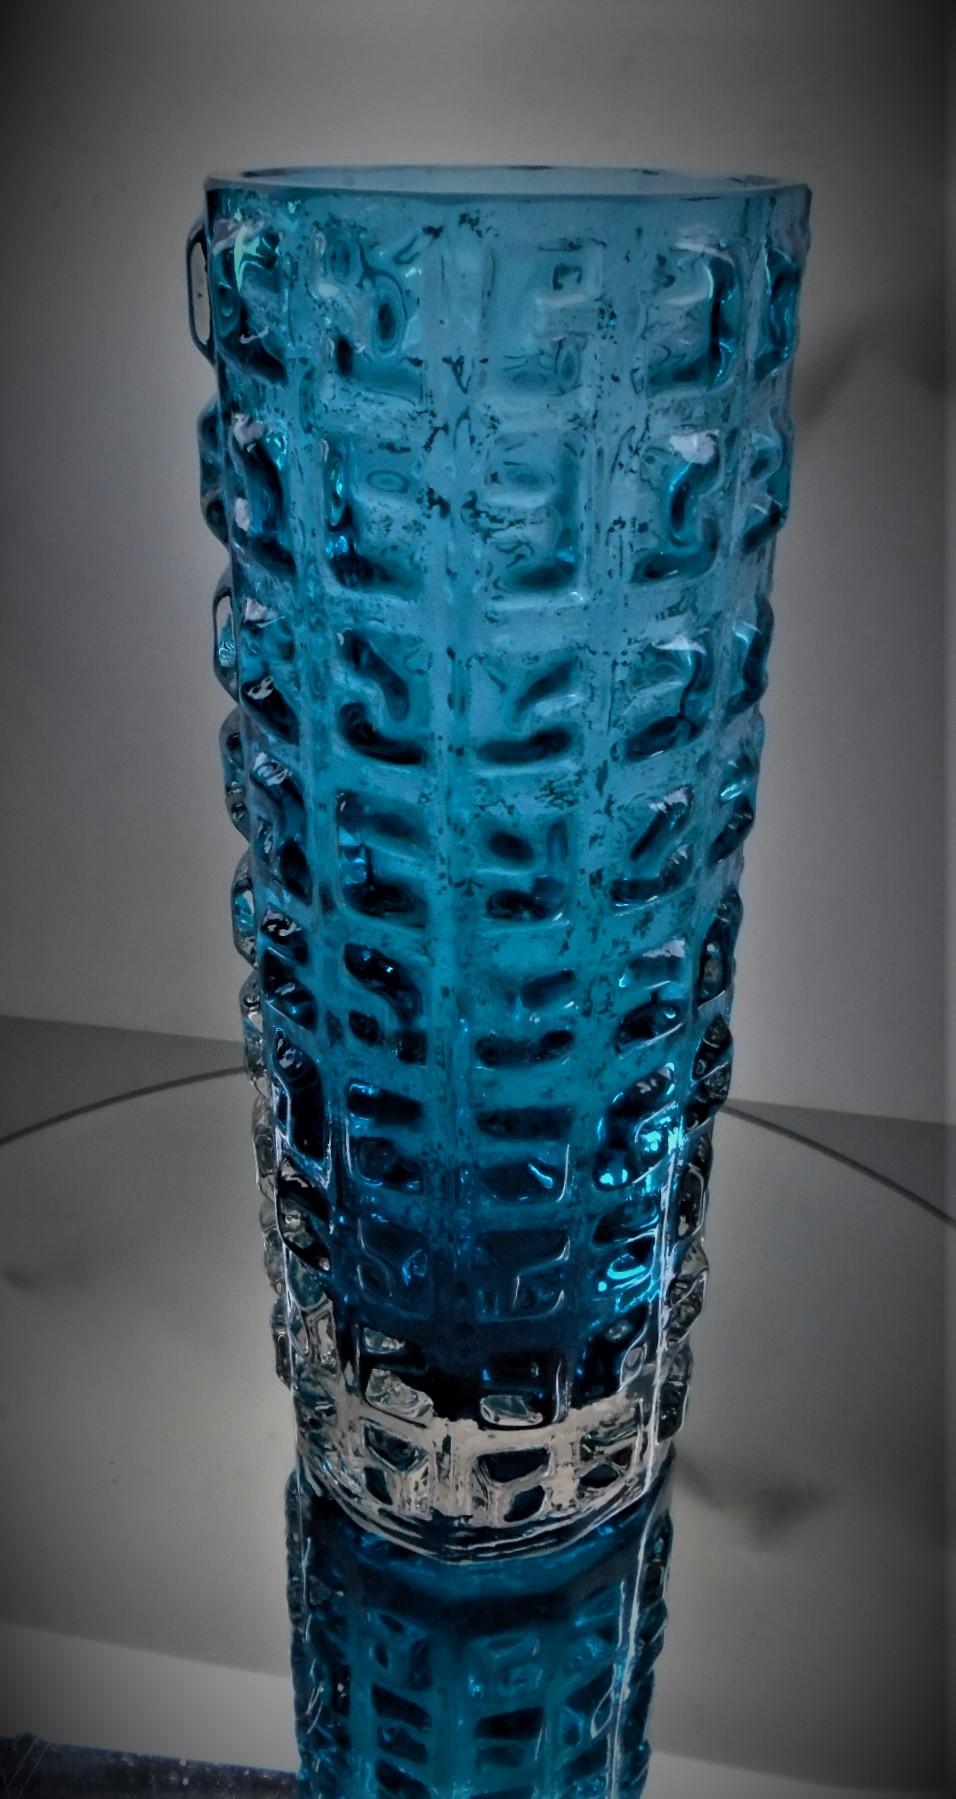 Vintage Geoffrey Baxter 70s WHITEFRIARS GLASS AZTEC Pressed Glass Vase in Kingfisher Pattern No 9816